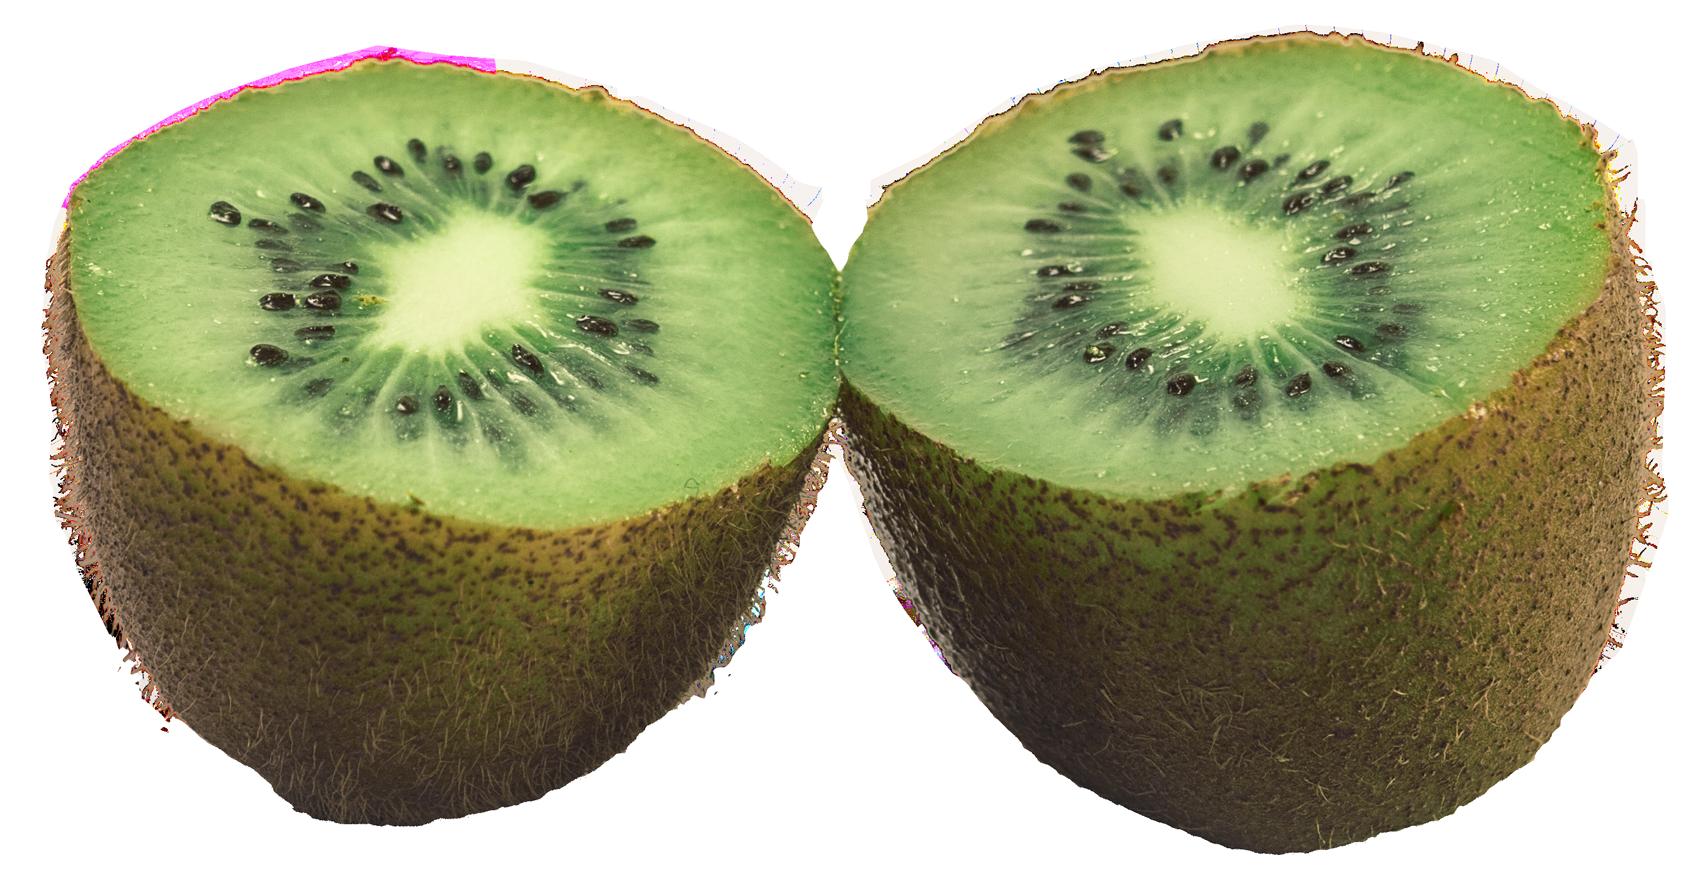 Png transparent image pngpix. Kiwi clipart green fruit